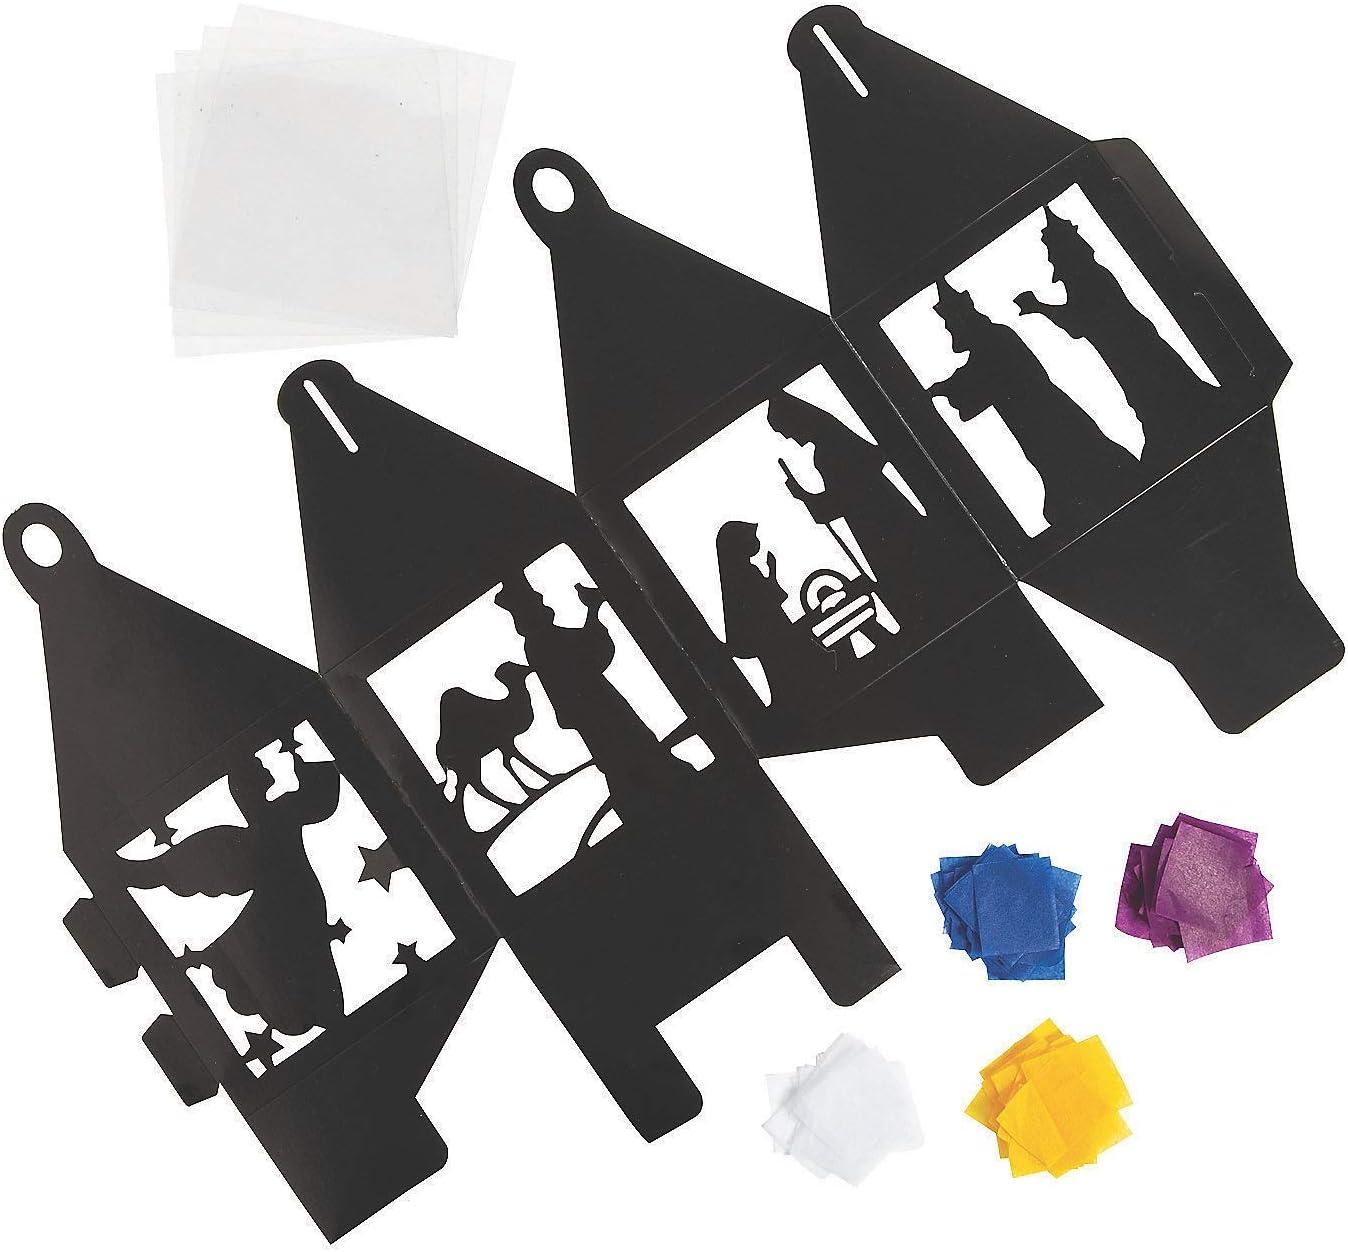 3D Tissue Paper Nativity Lantern Craft Kit Makes 12